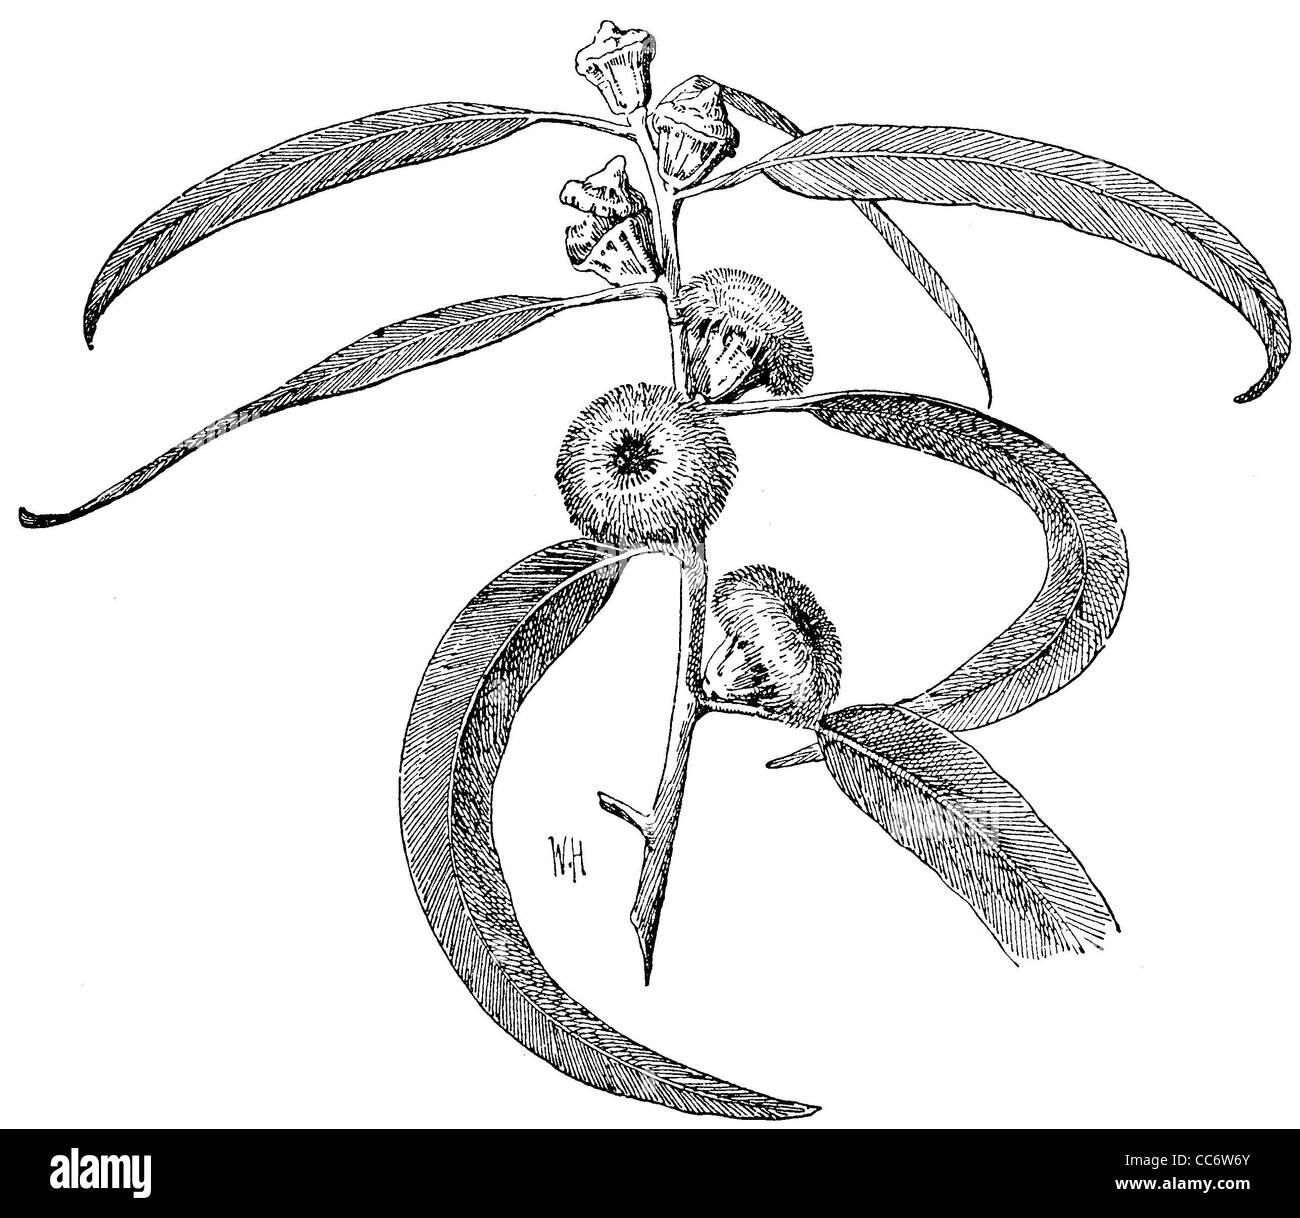 Eucalyptus: Flowering branch - Stock Image